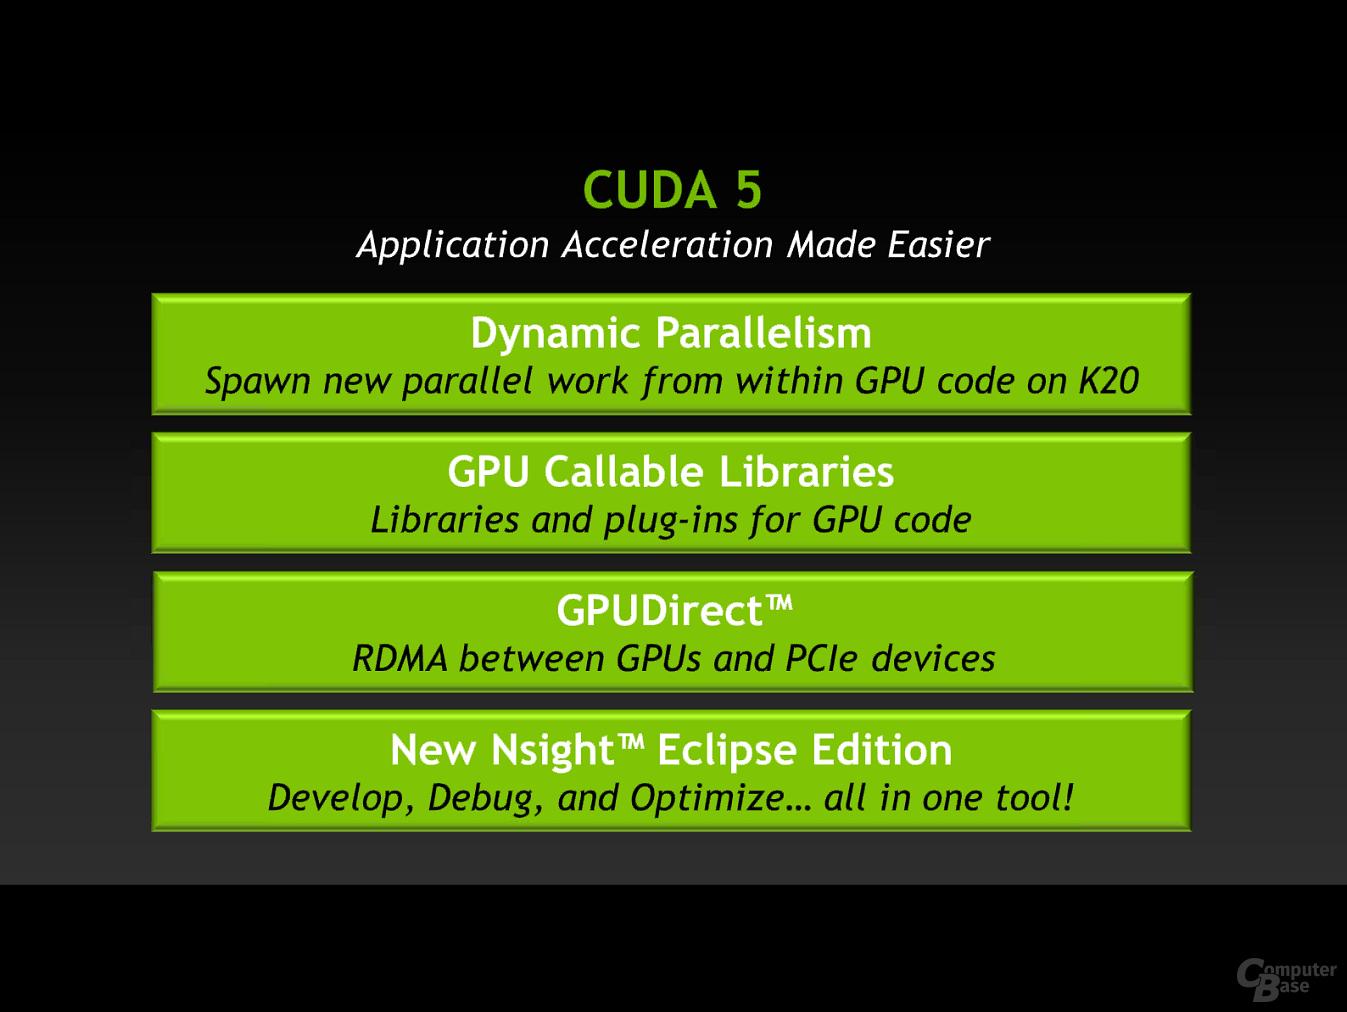 Nvidia CUDA 5